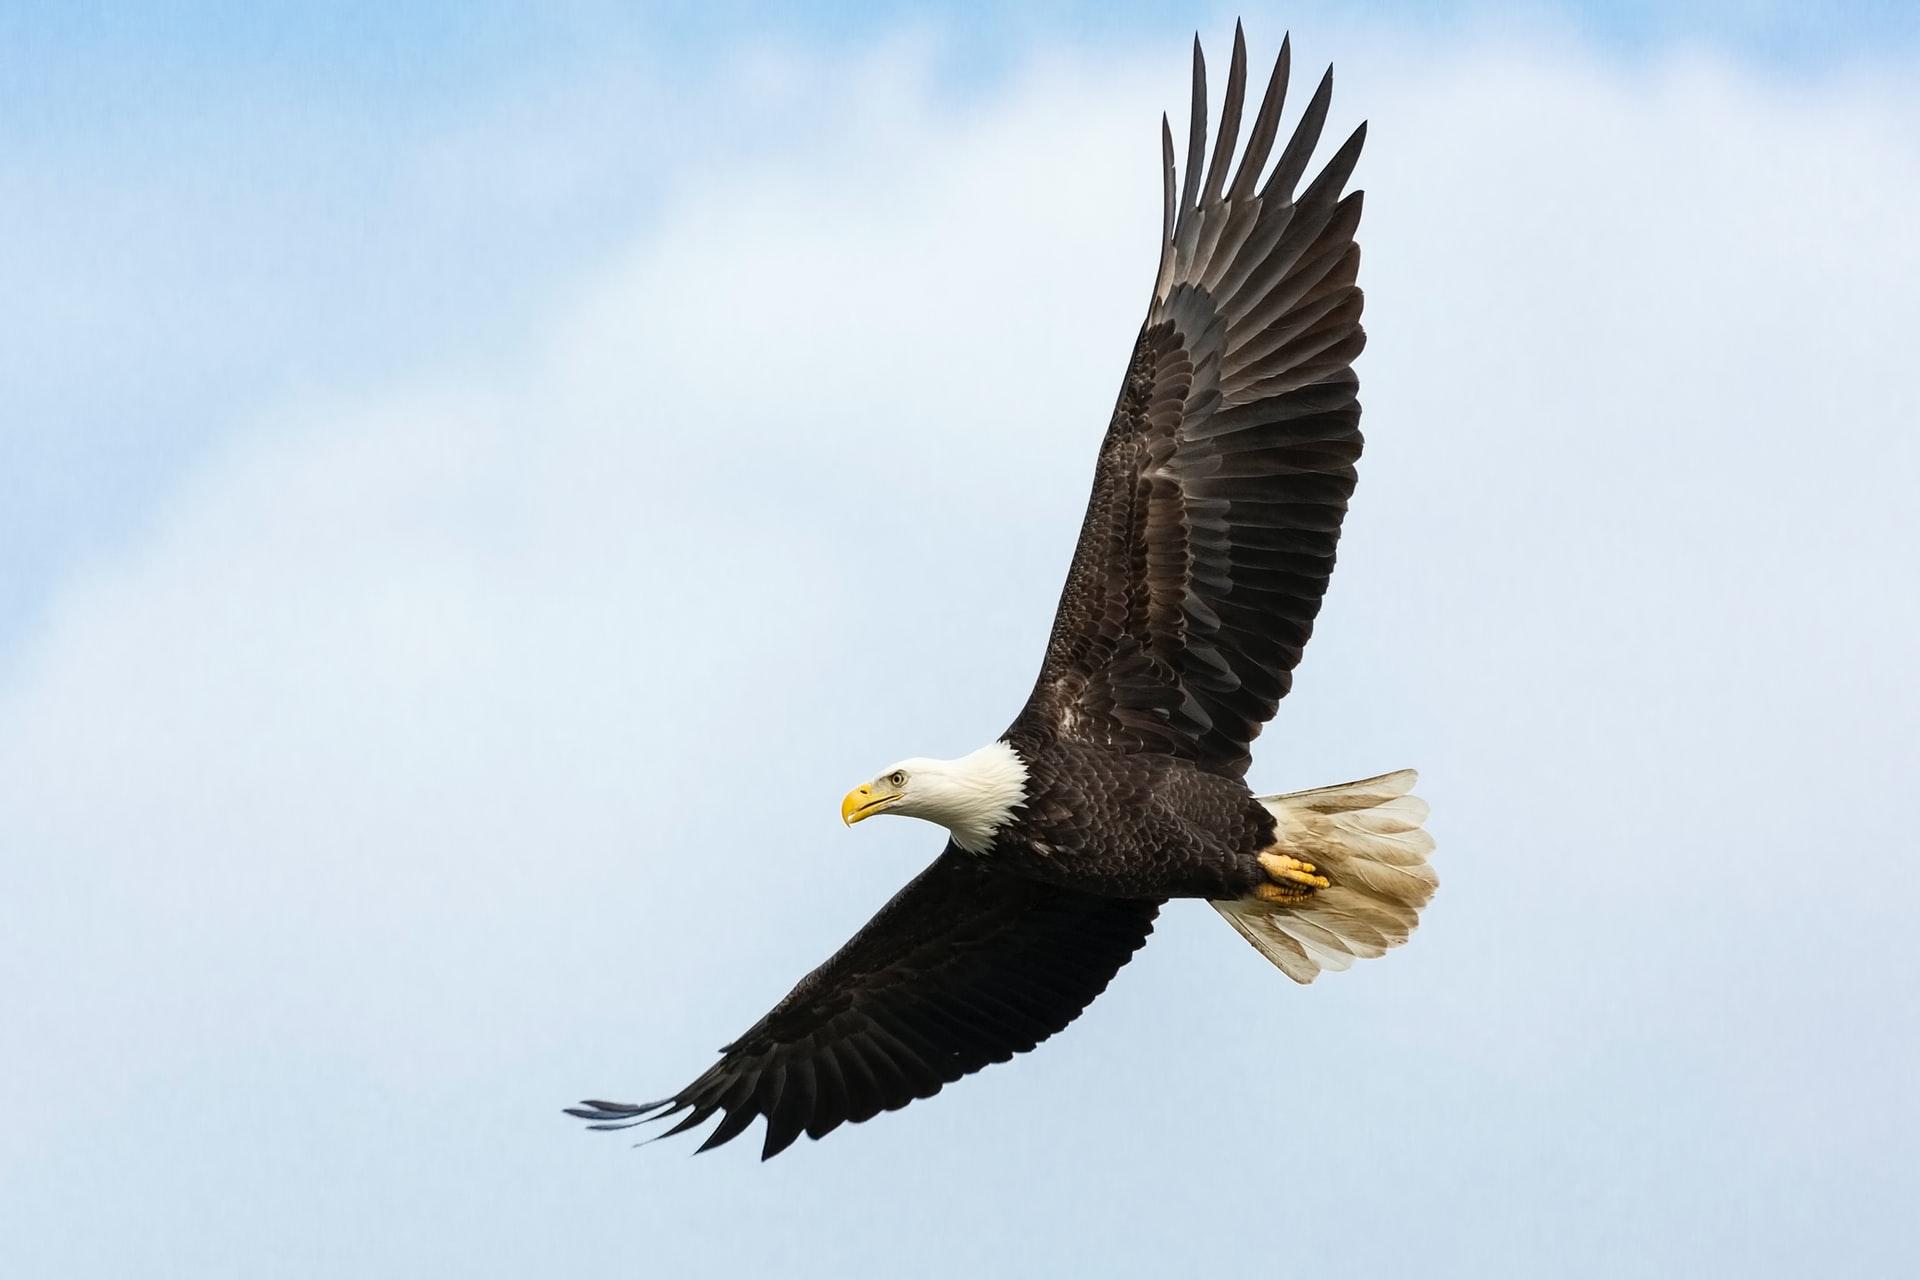 Wildlife Center Releases Rehabbed Bald Eagle